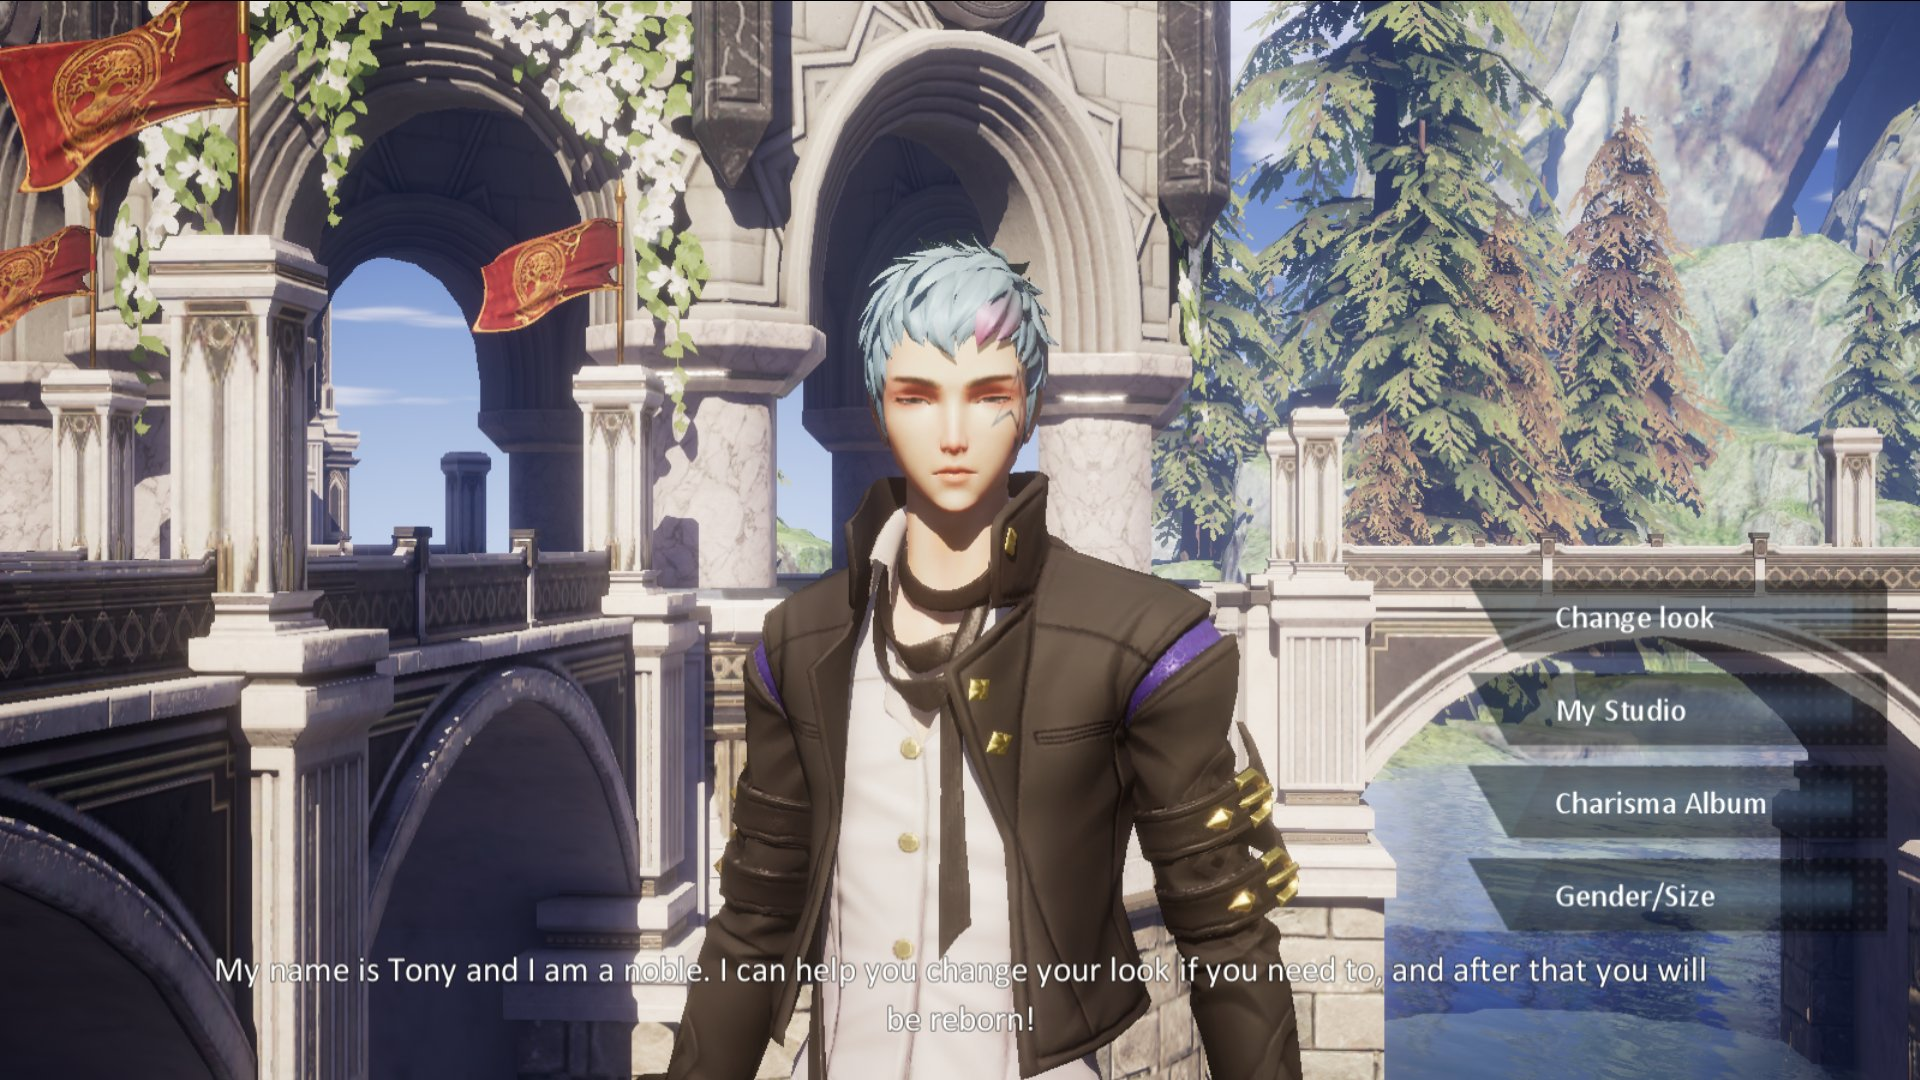 Dragon Raja Character Appearance